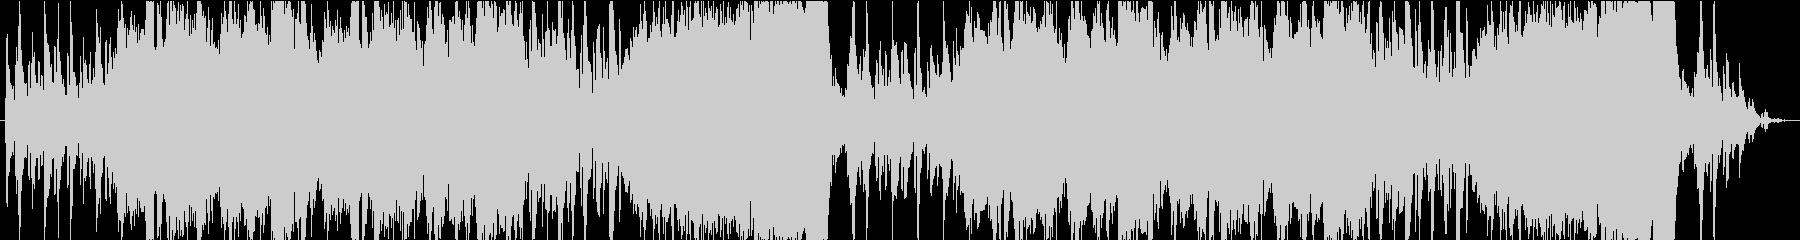 RPG向け炎のダンジョンステージBGMの未再生の波形